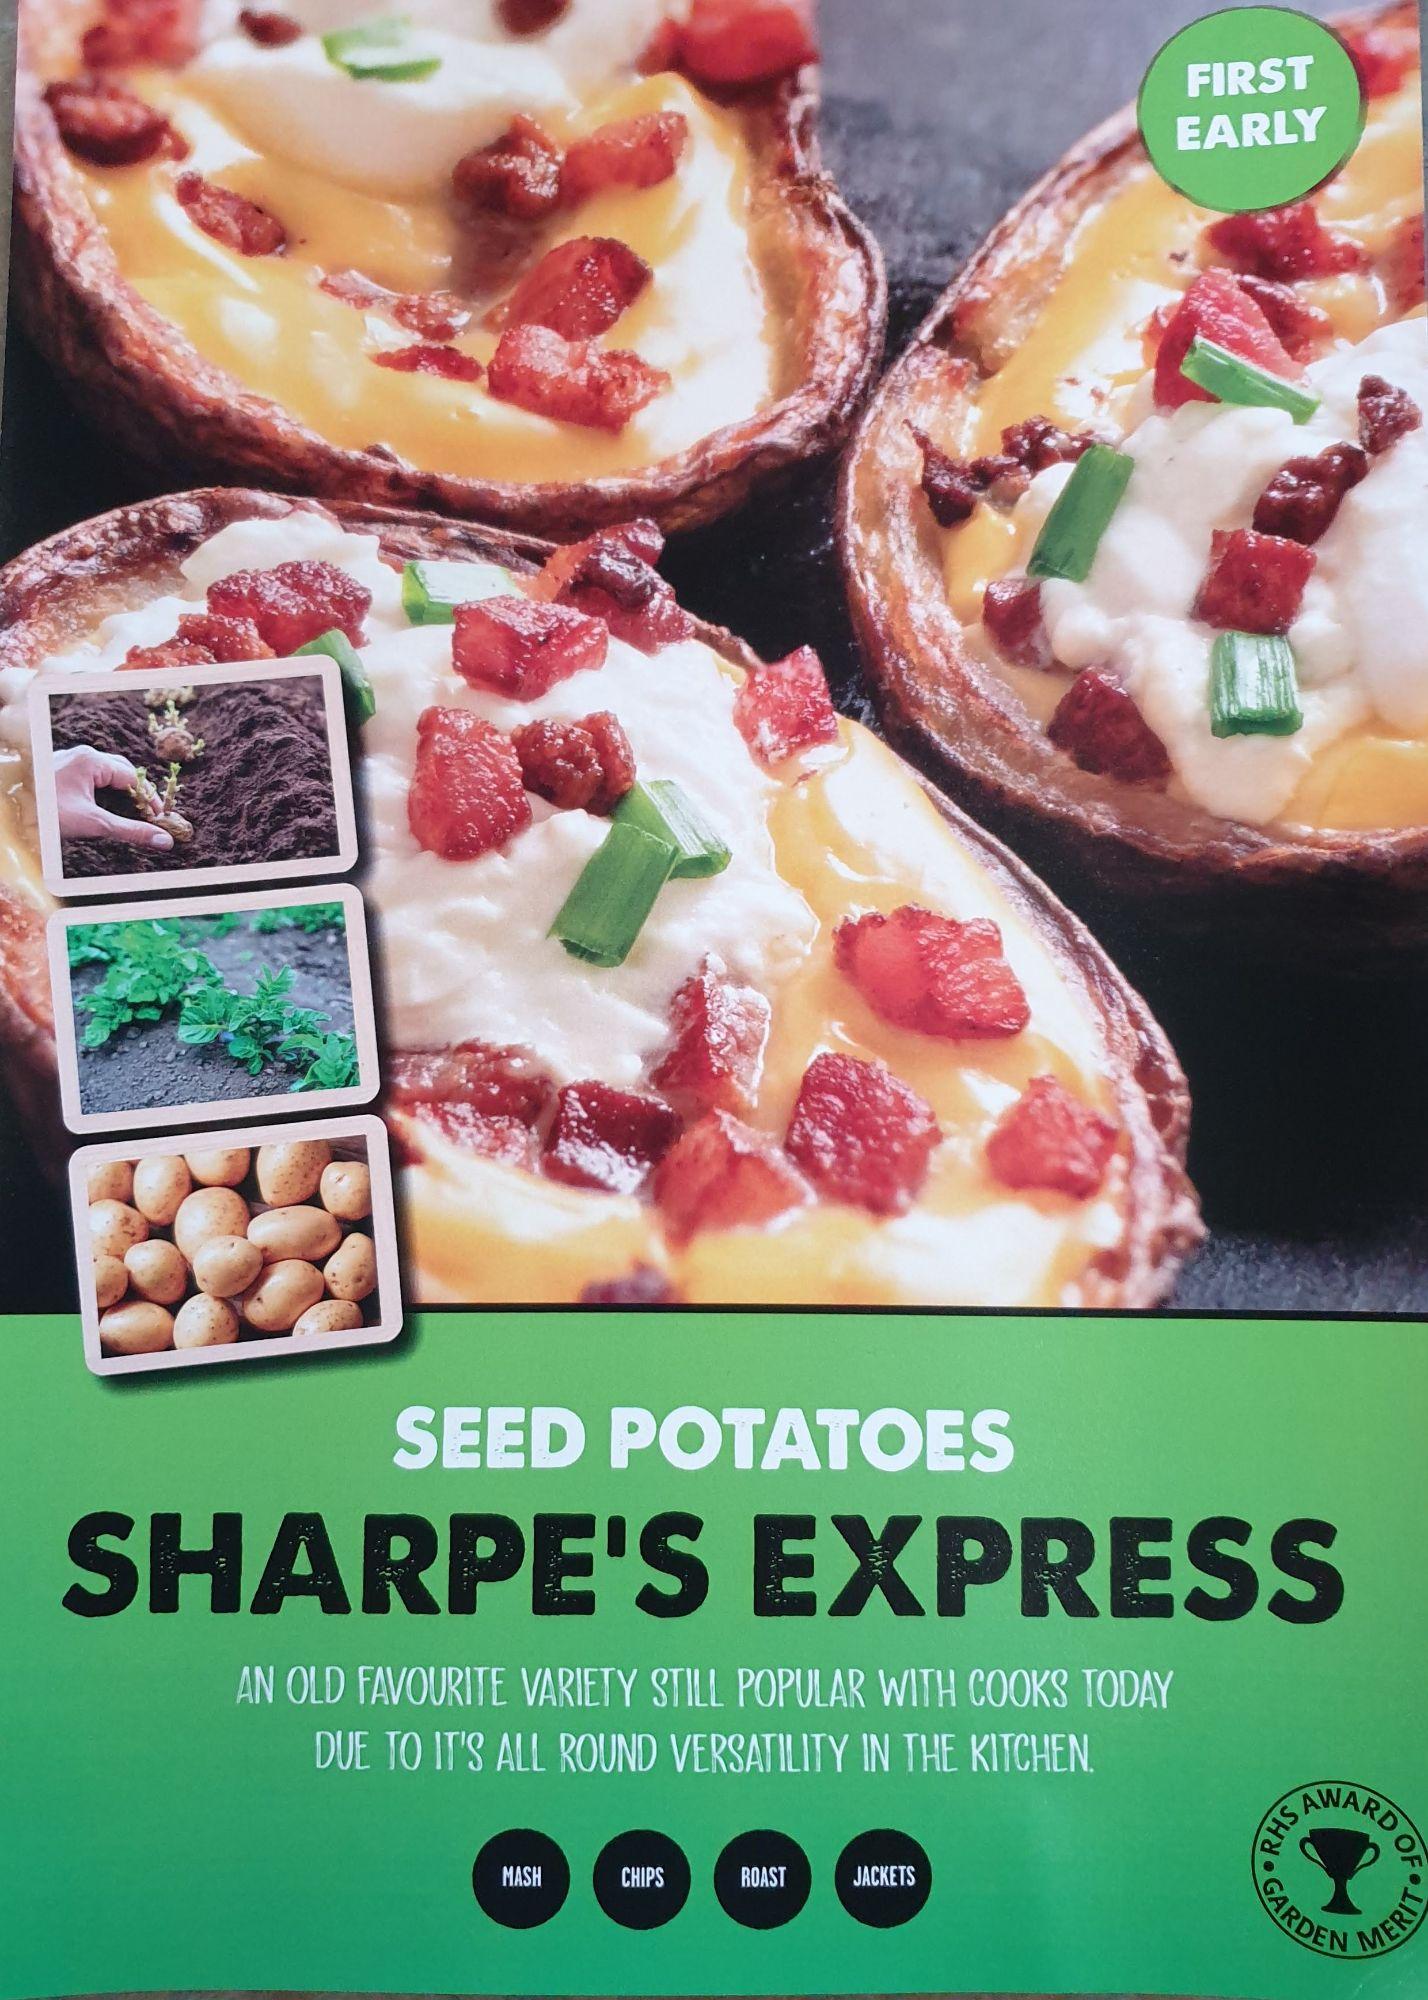 sharpers_express_seed_potato_info.jpg